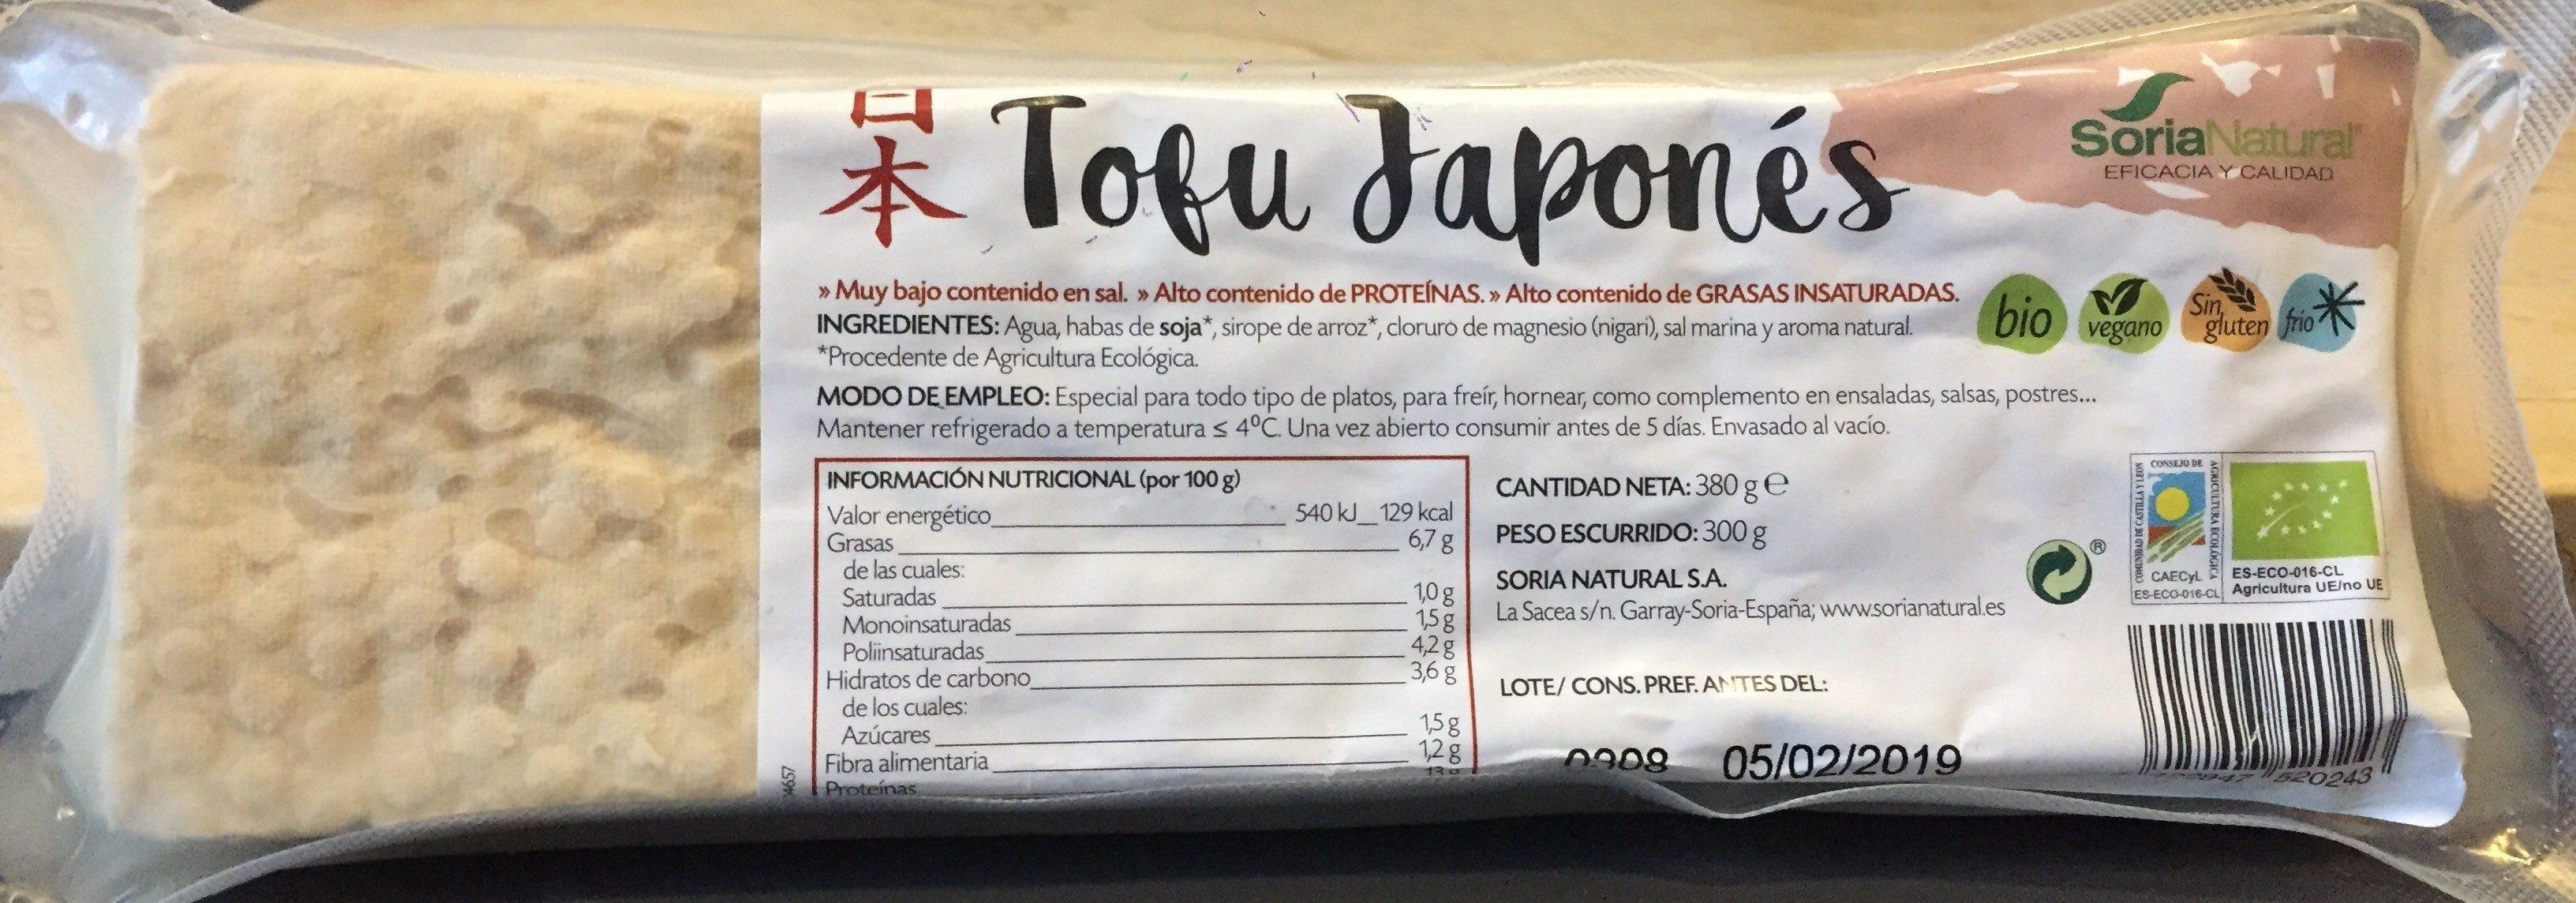 Tofu Japonés - Producto - es